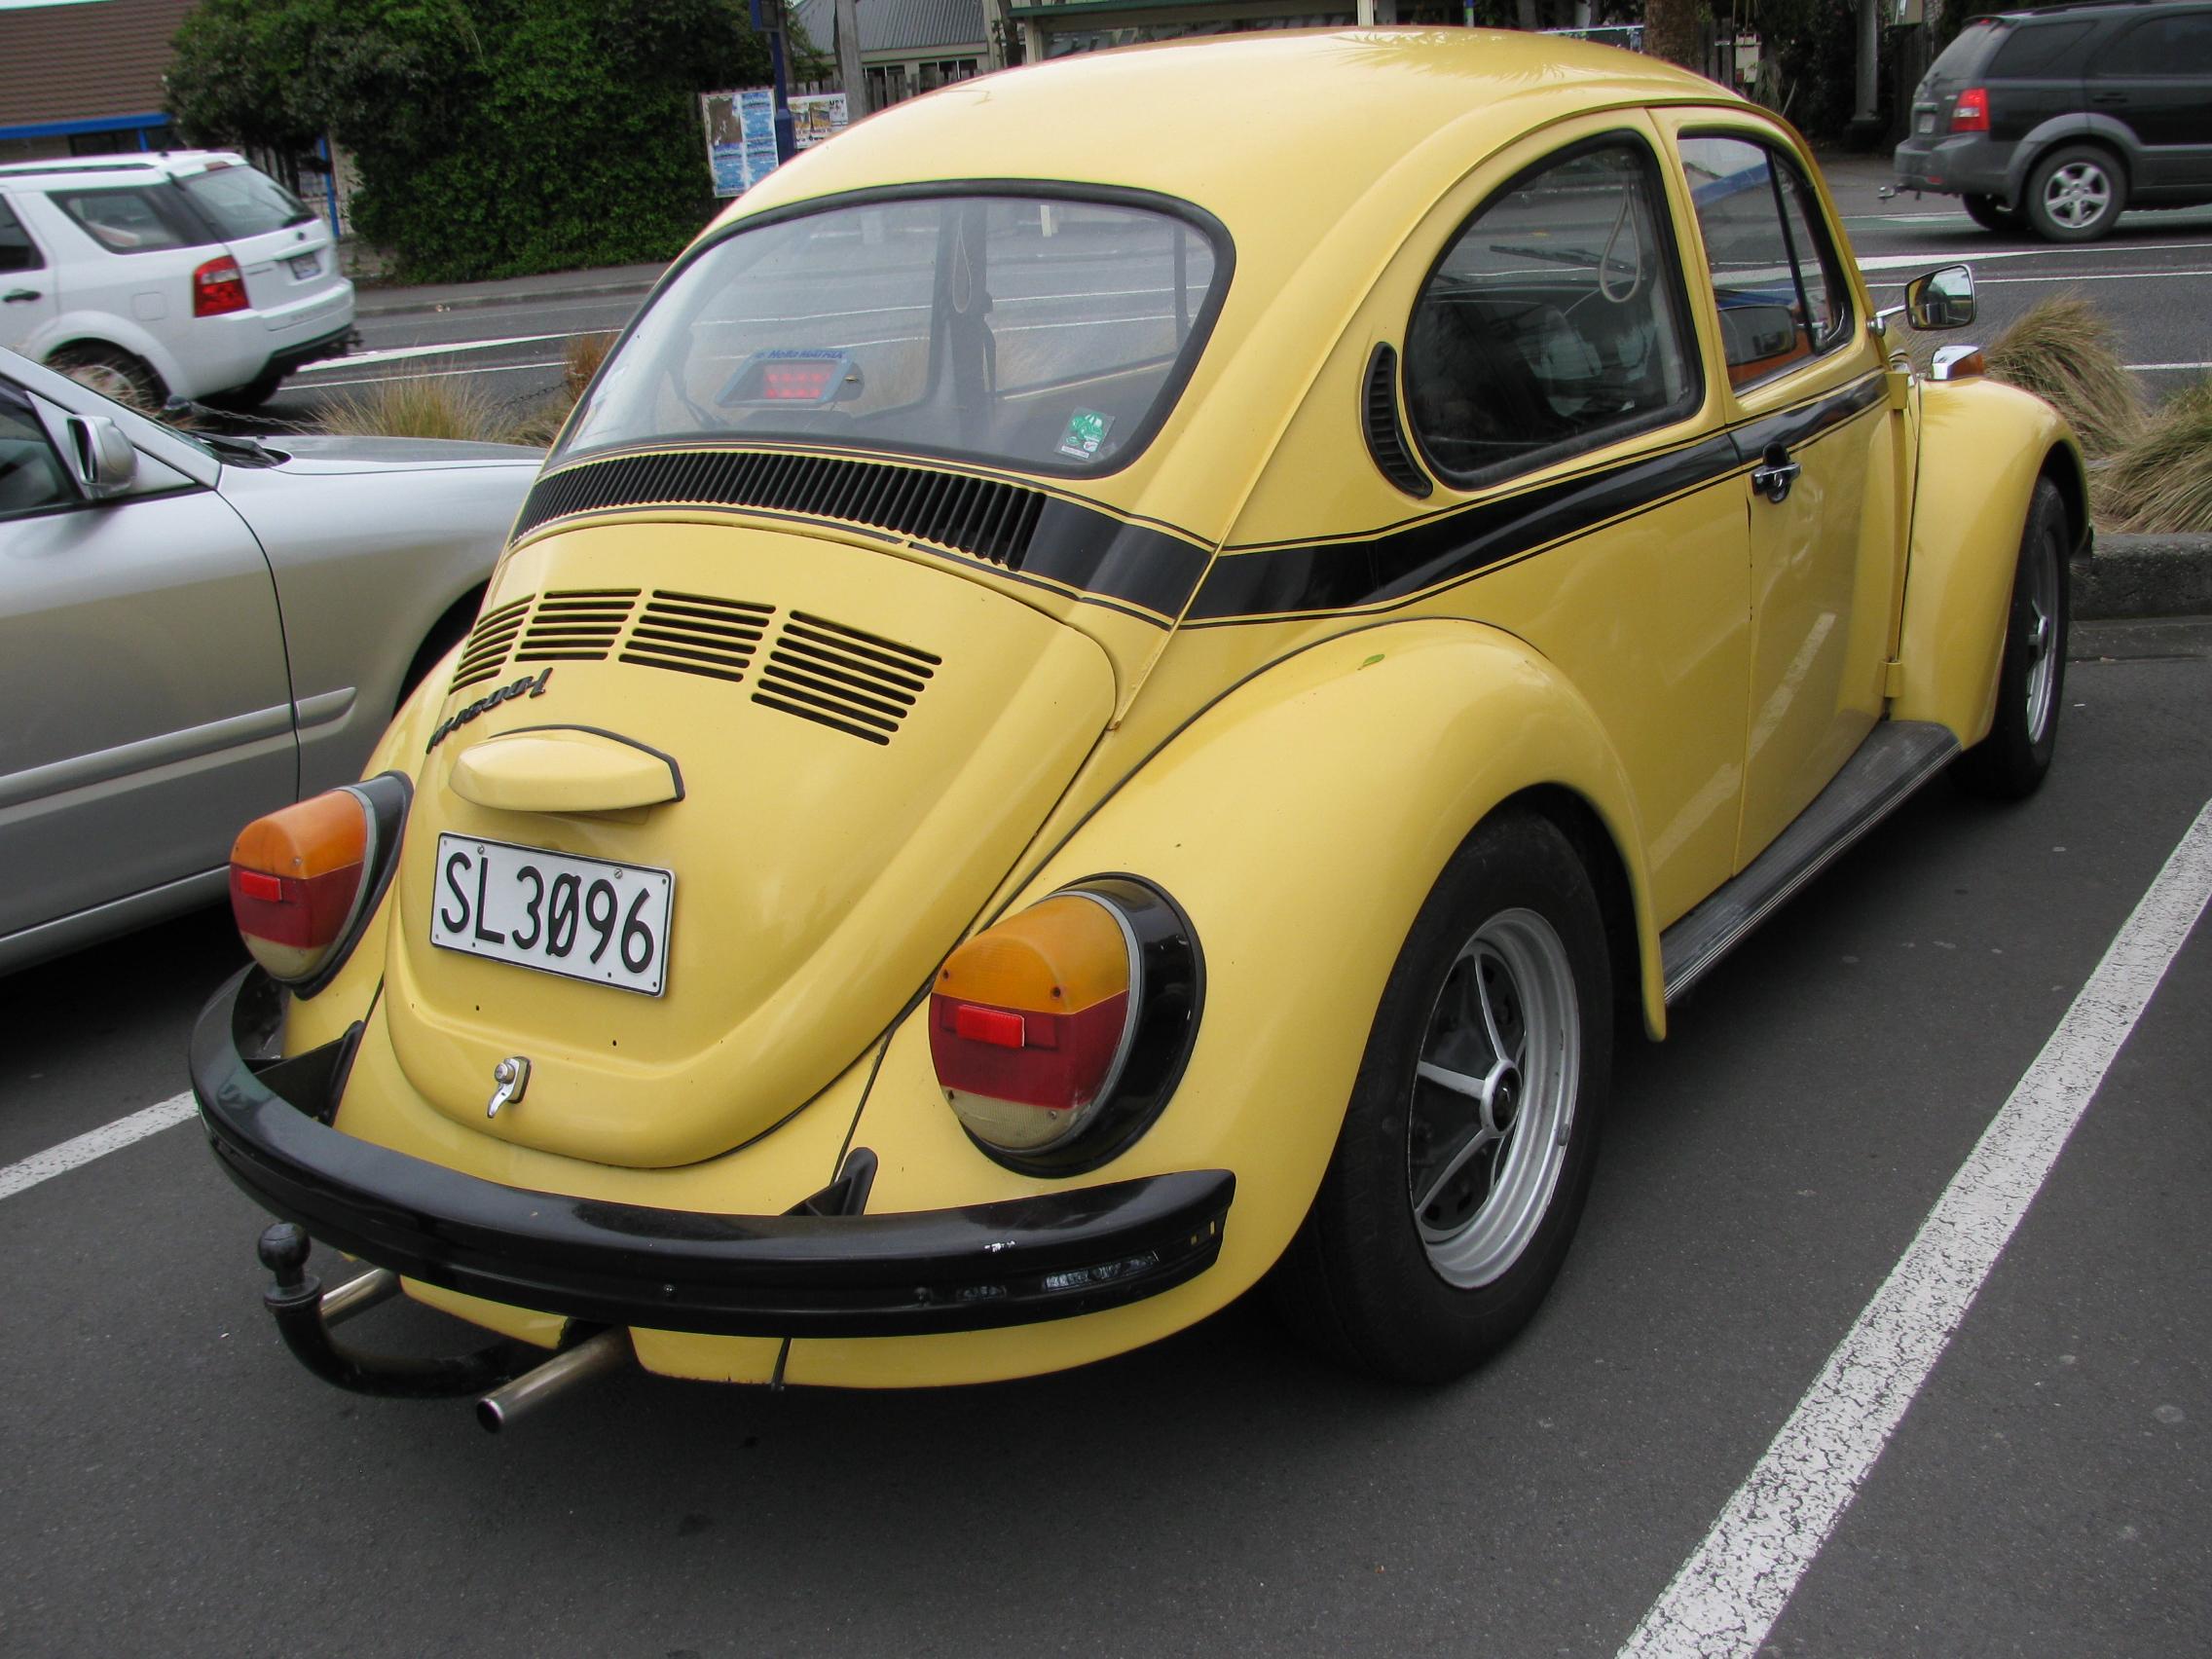 file 1974 volkswagen 1600 beetle 39 fun bug 39 6265727316 jpg wikimedia commons. Black Bedroom Furniture Sets. Home Design Ideas